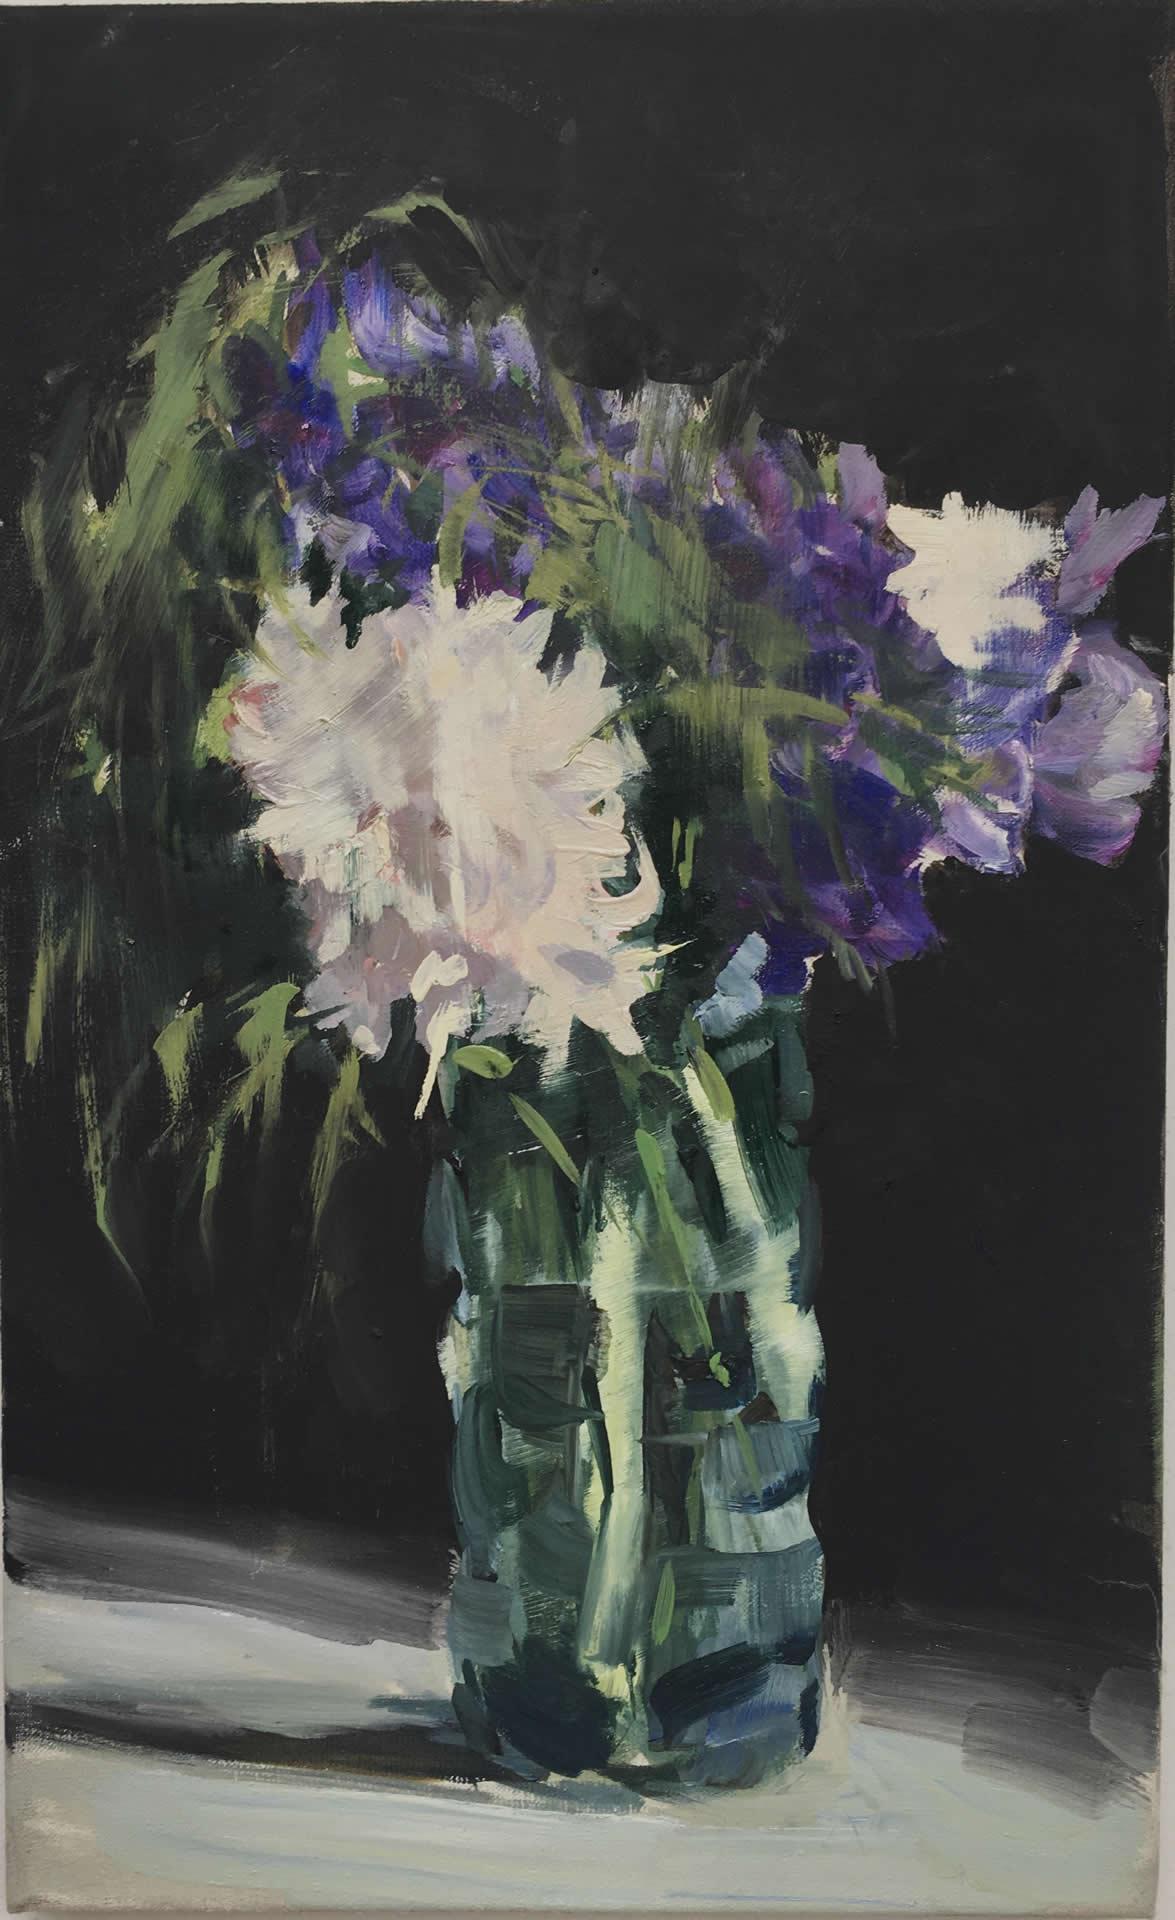 Alex Amann | O.T. | 2020 | Öl auf Leinwand | 45x28cm | plaisirs simples | Galerie3